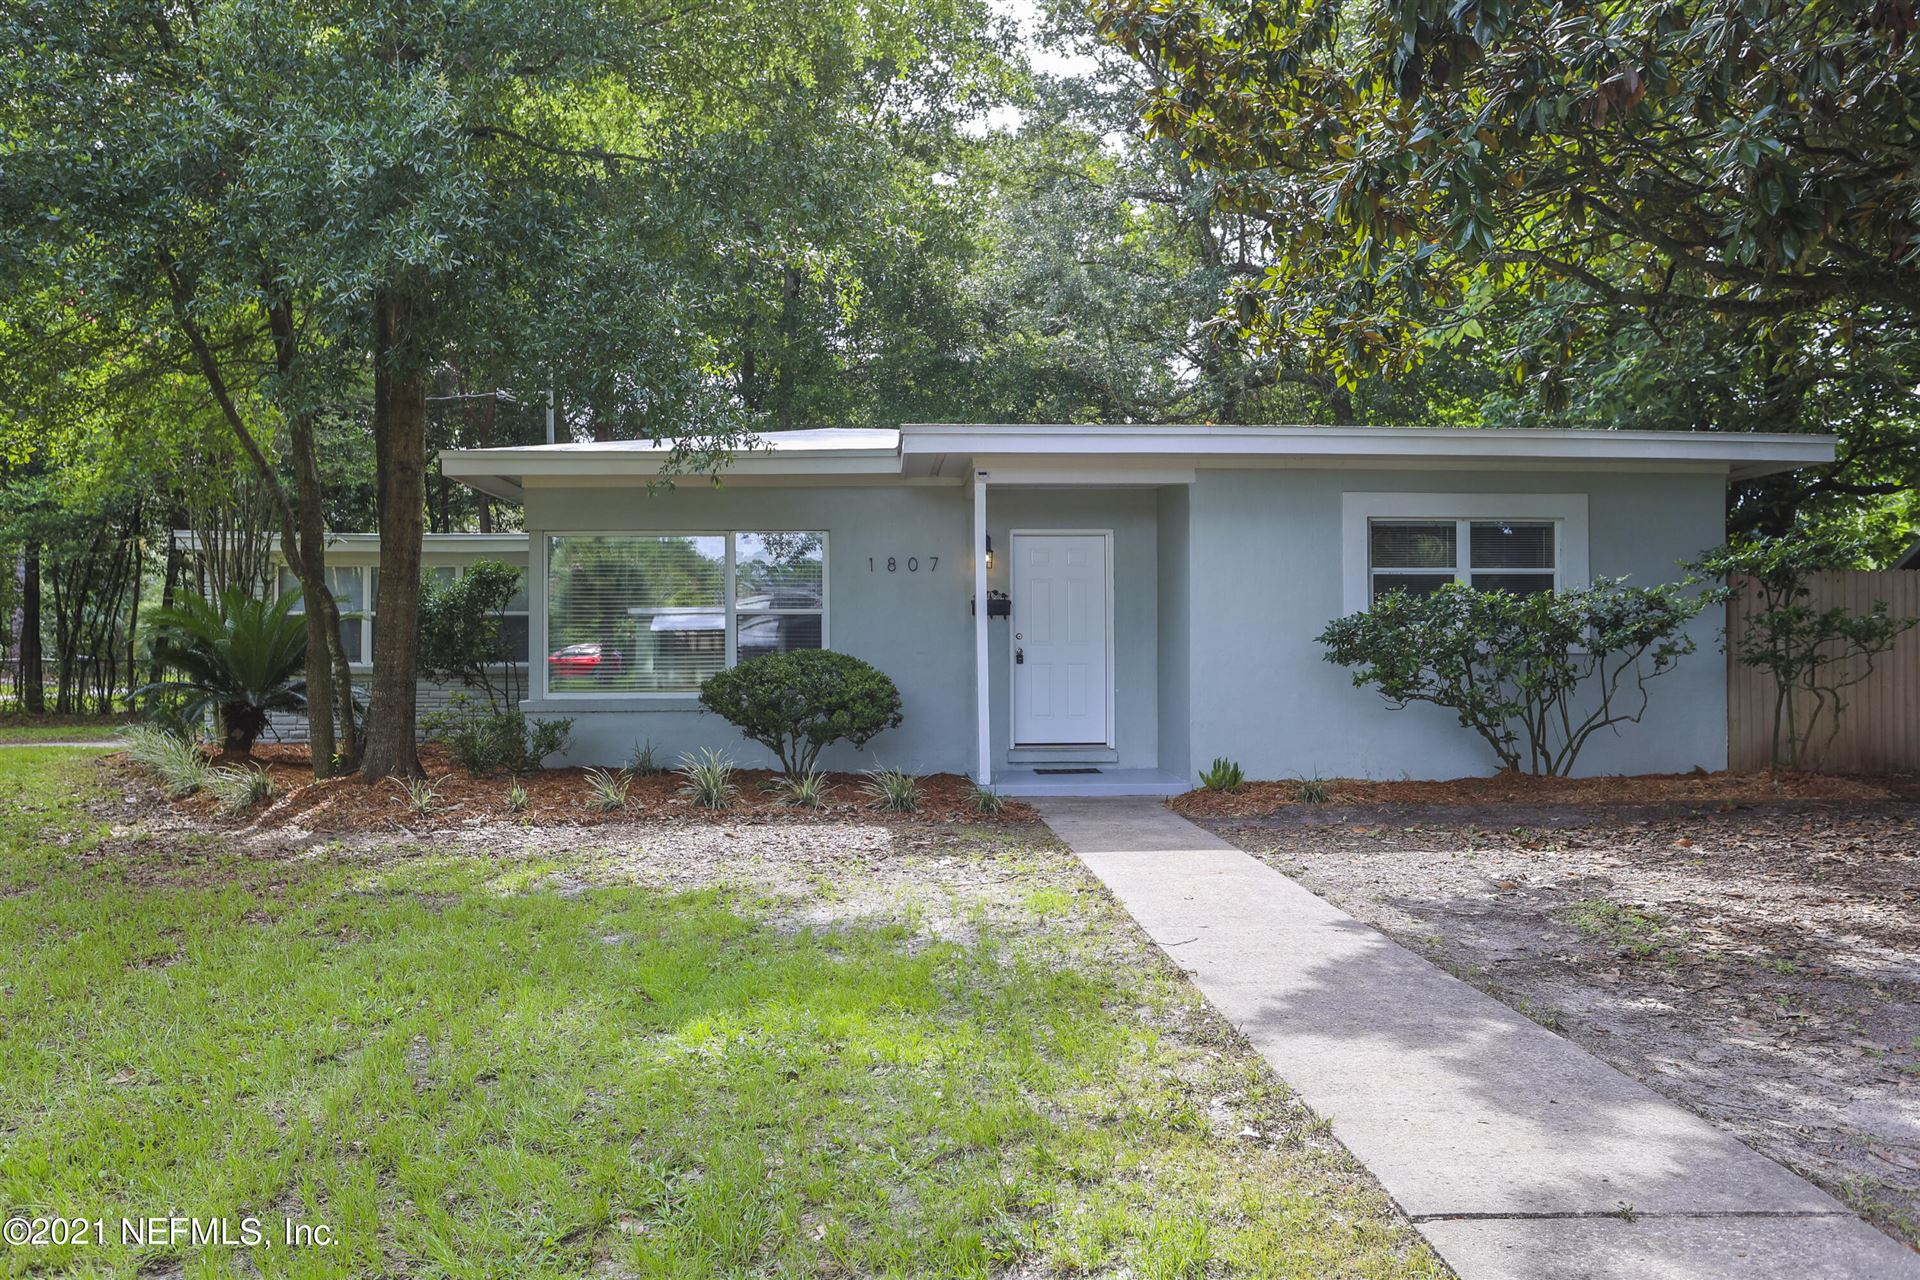 1807 HARVESTER ST #Unit No: 4 Lot No: 2, Jacksonville, FL 32210 - MLS#: 1121820